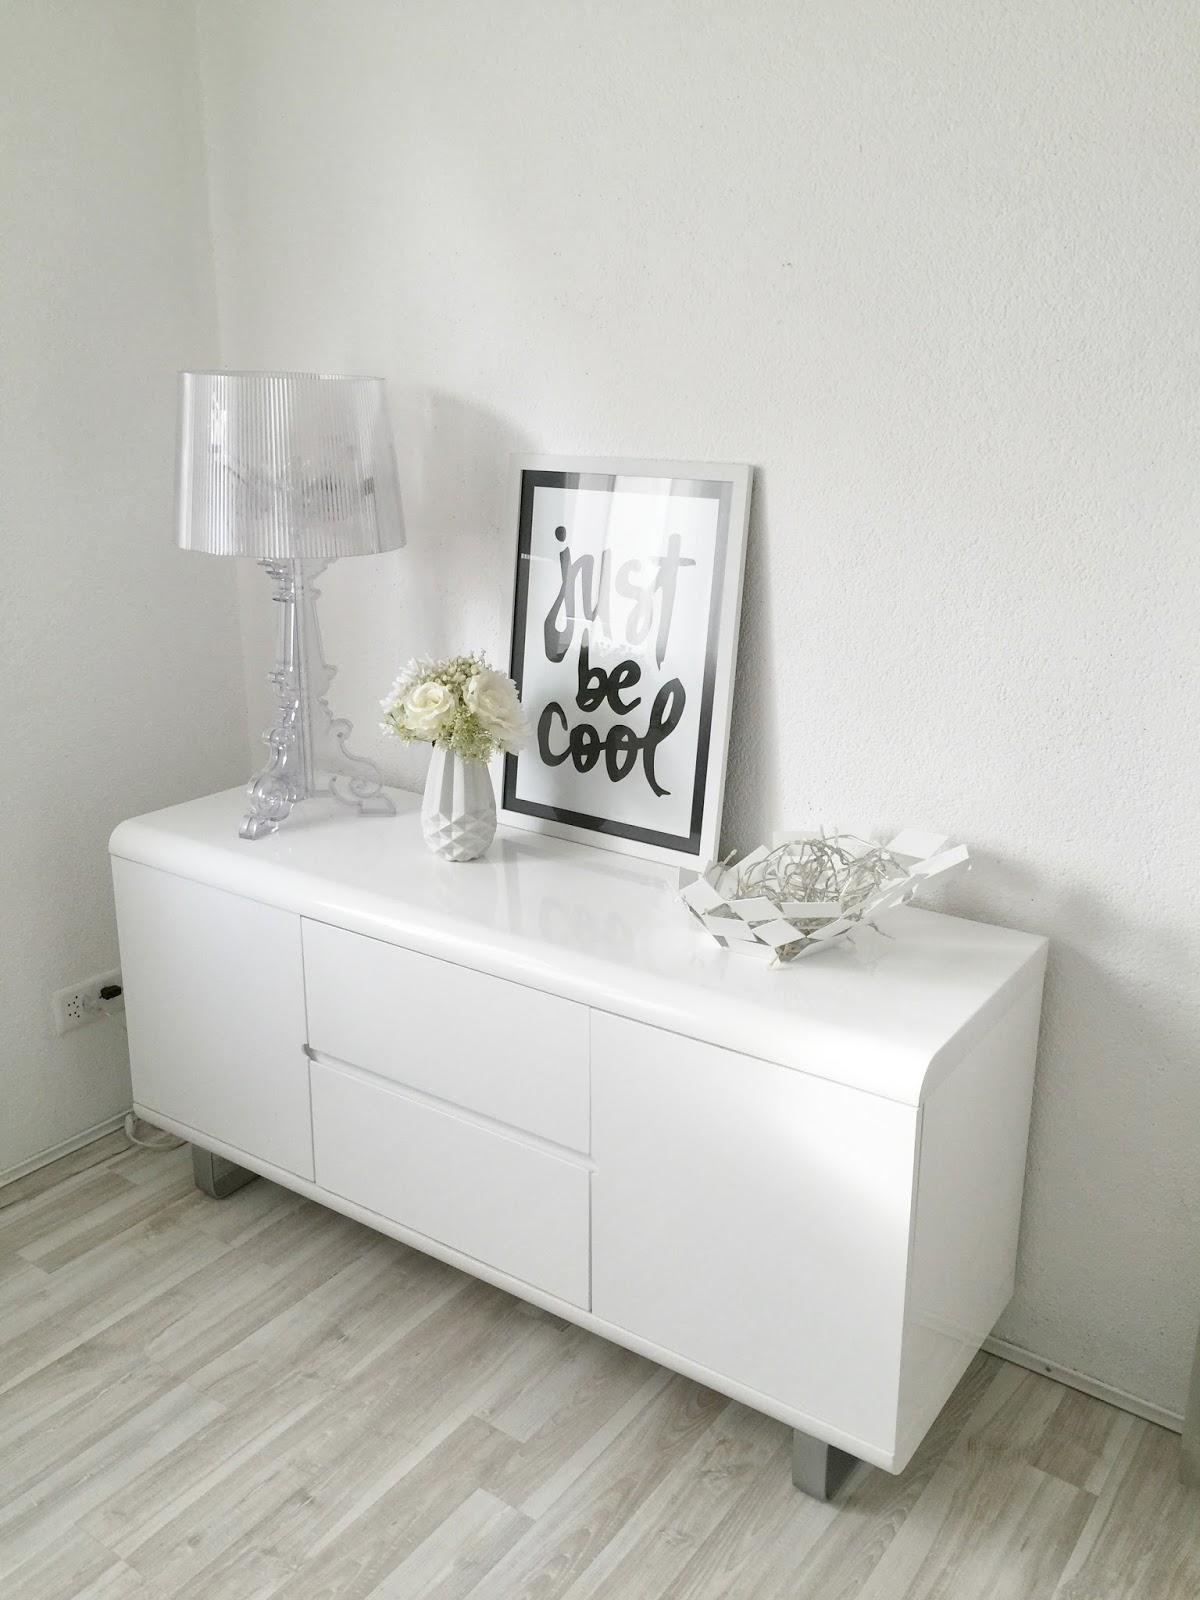 deco buffet salon. Black Bedroom Furniture Sets. Home Design Ideas